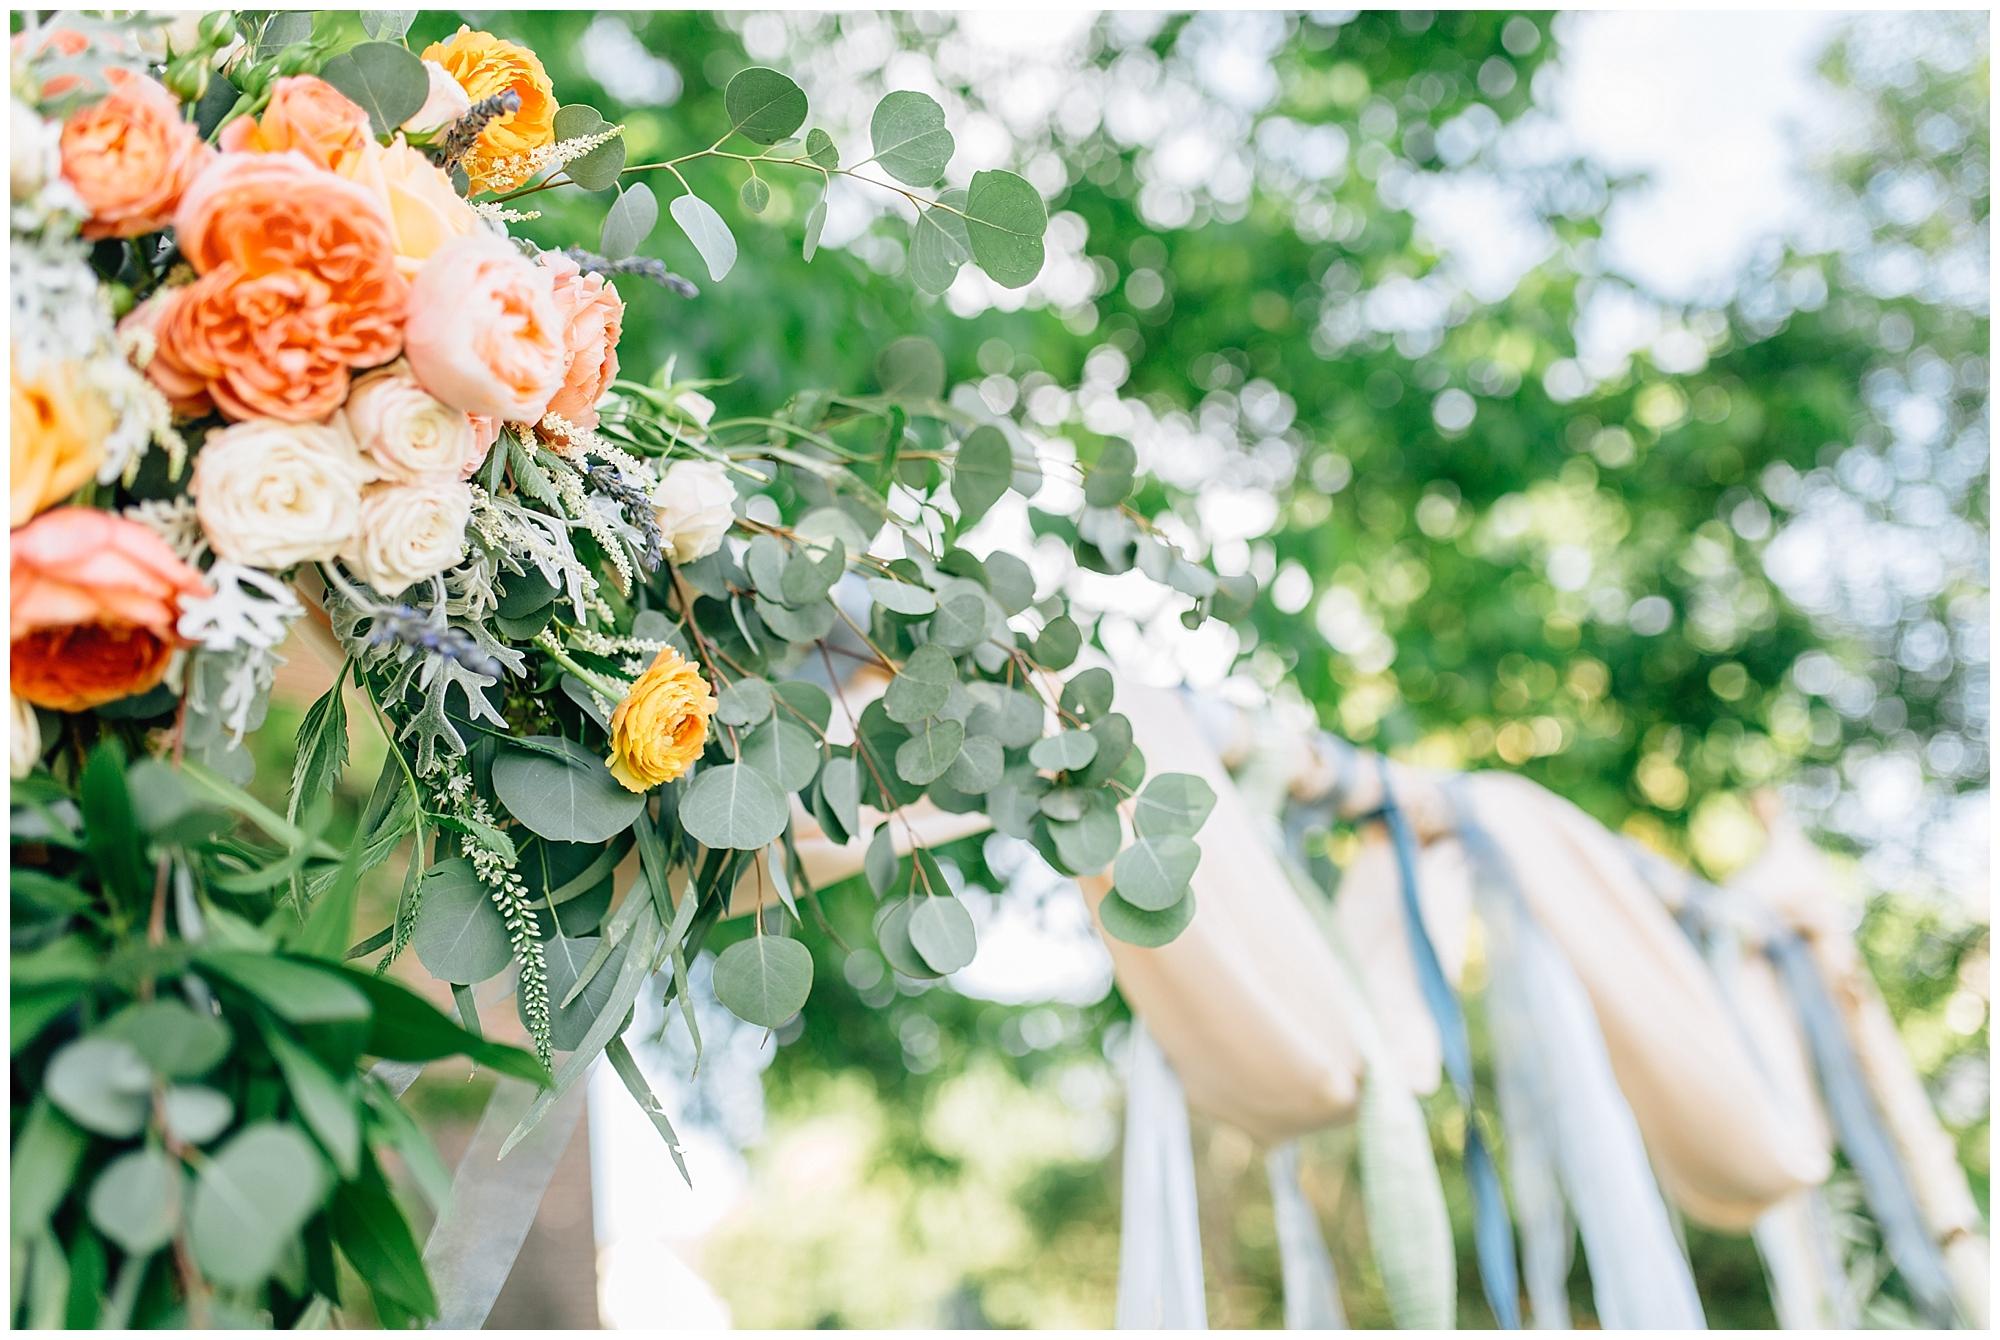 Merrimon-Wynne-Raleigh-Wedding-17.jpg